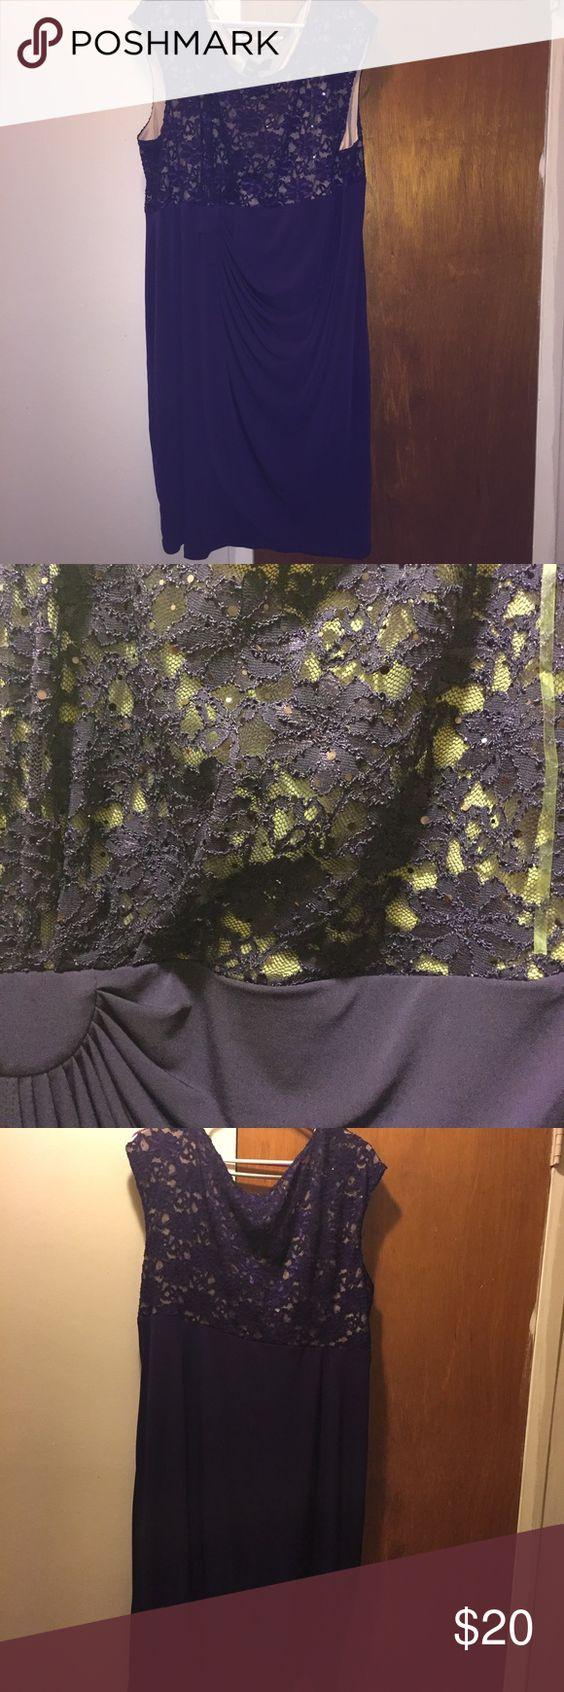 Plus size dress Beautiful plus size dress worn once. Dresses